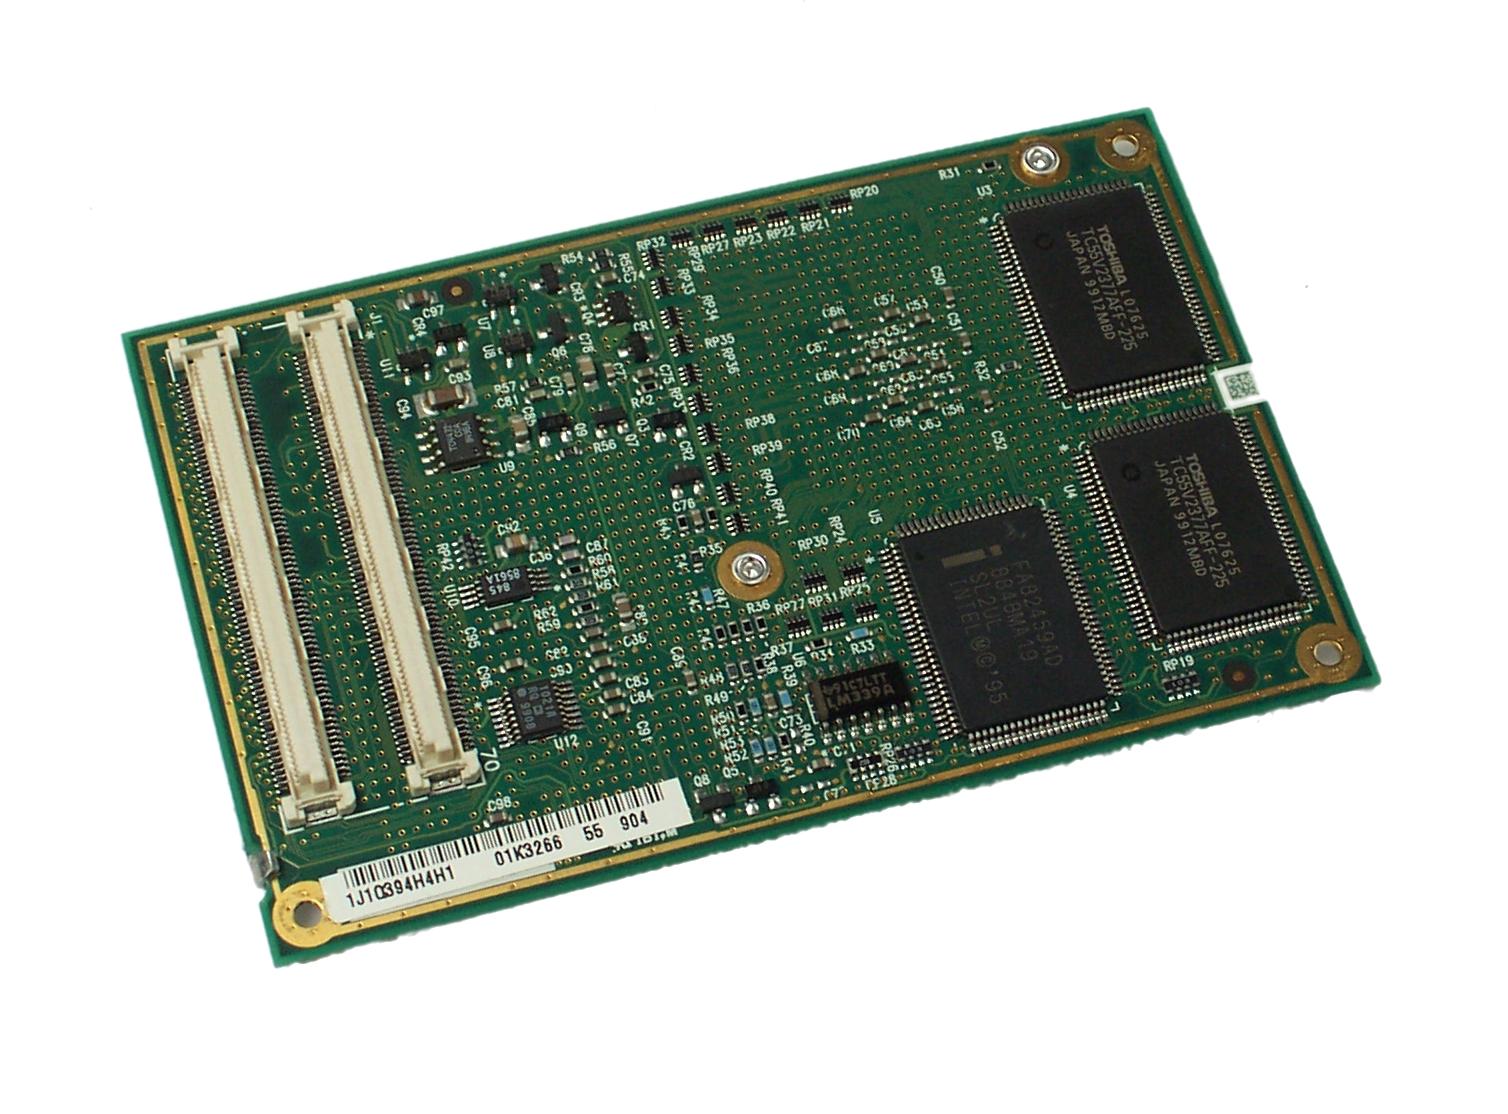 IBM 01K3266 ThinkPad 380Z Intel Pentium II 266Mhz CPU